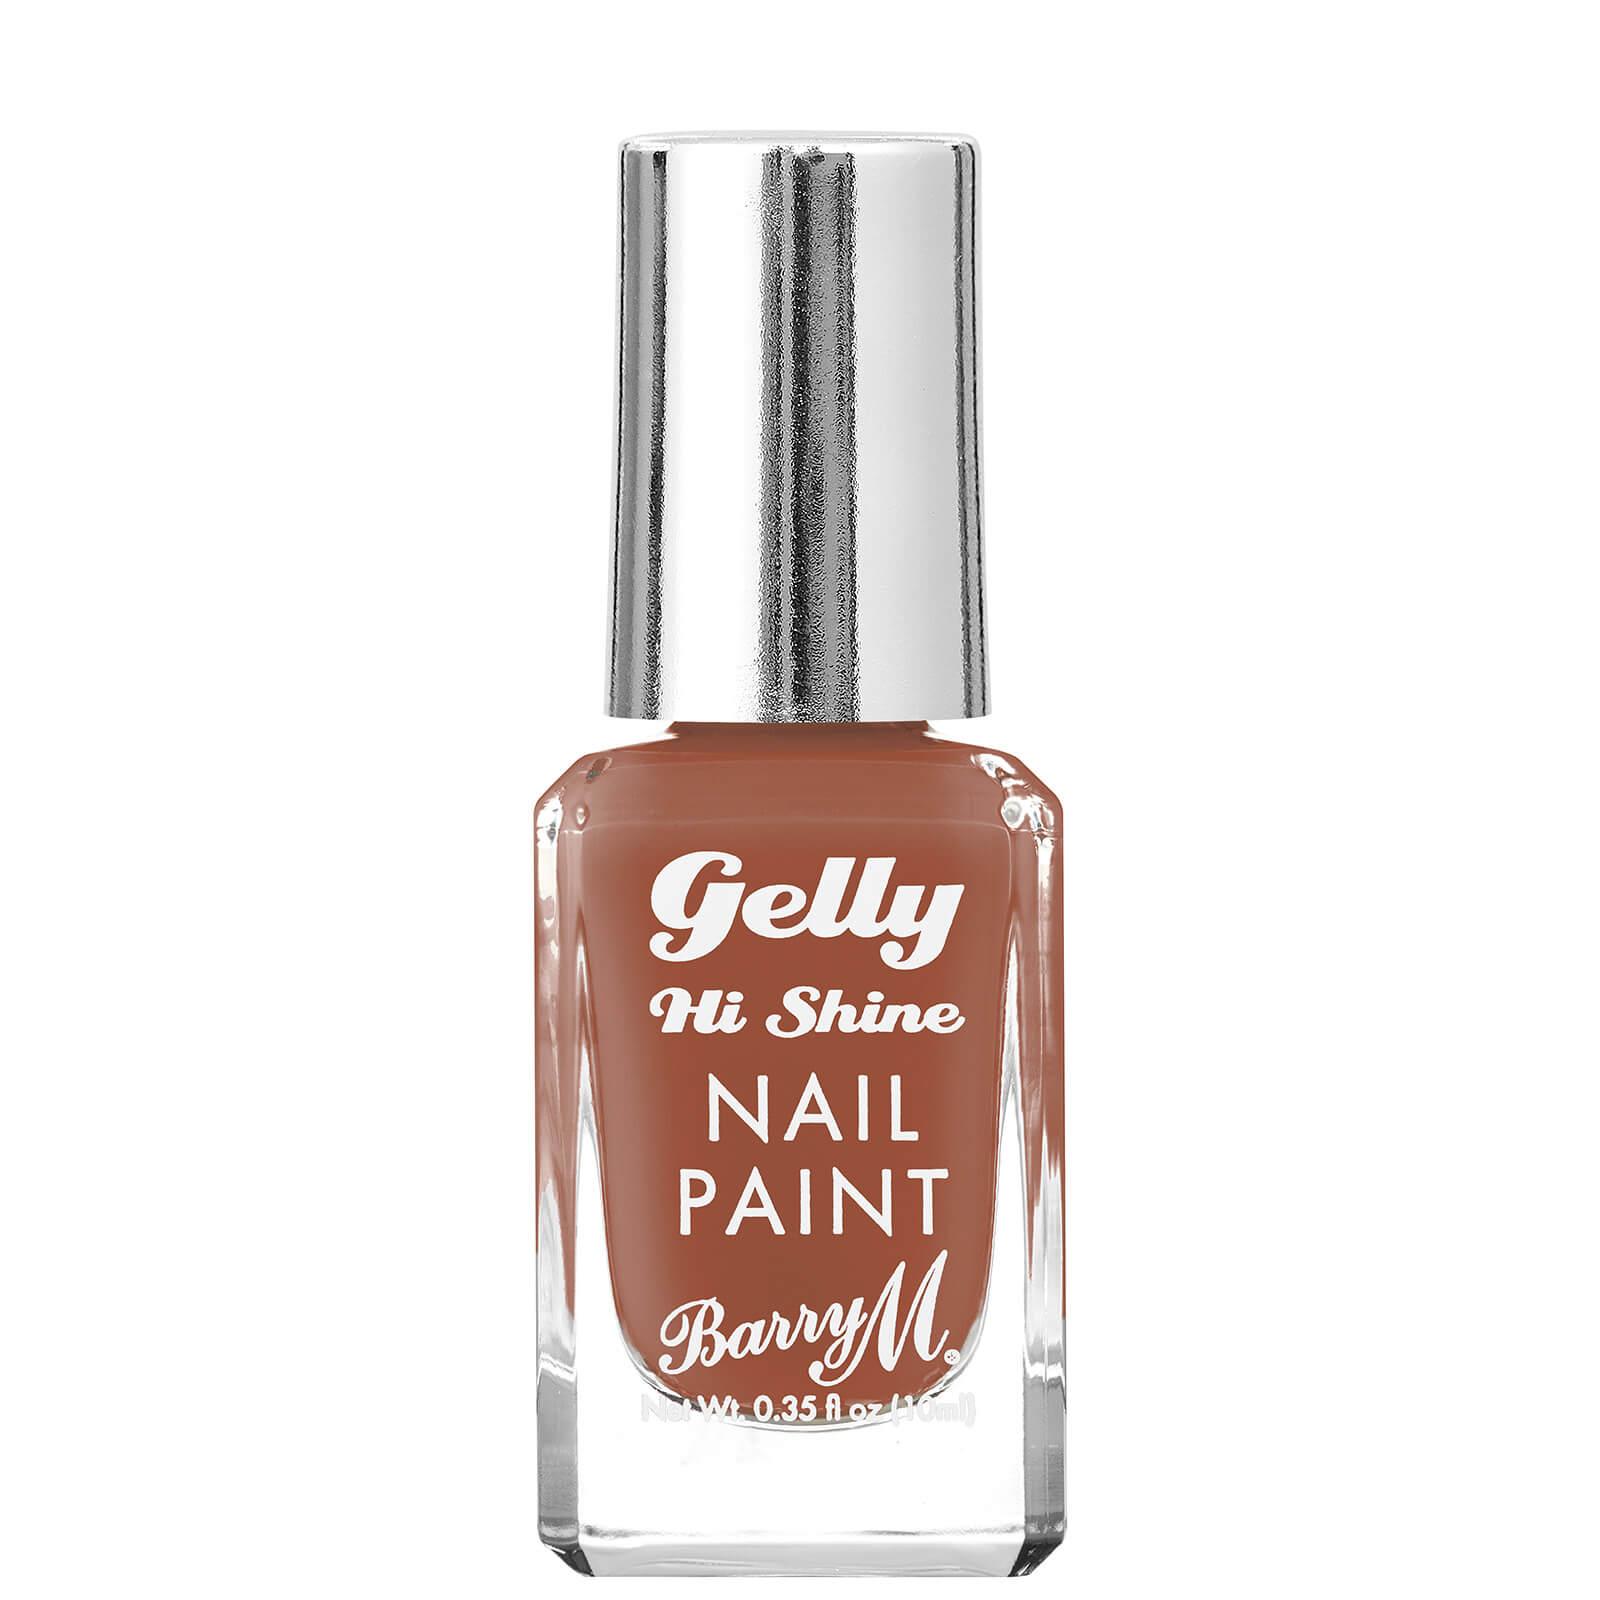 Купить Barry M Cosmetics Gelly Nail Paint 10ml (Various Shades) - Chai Latte